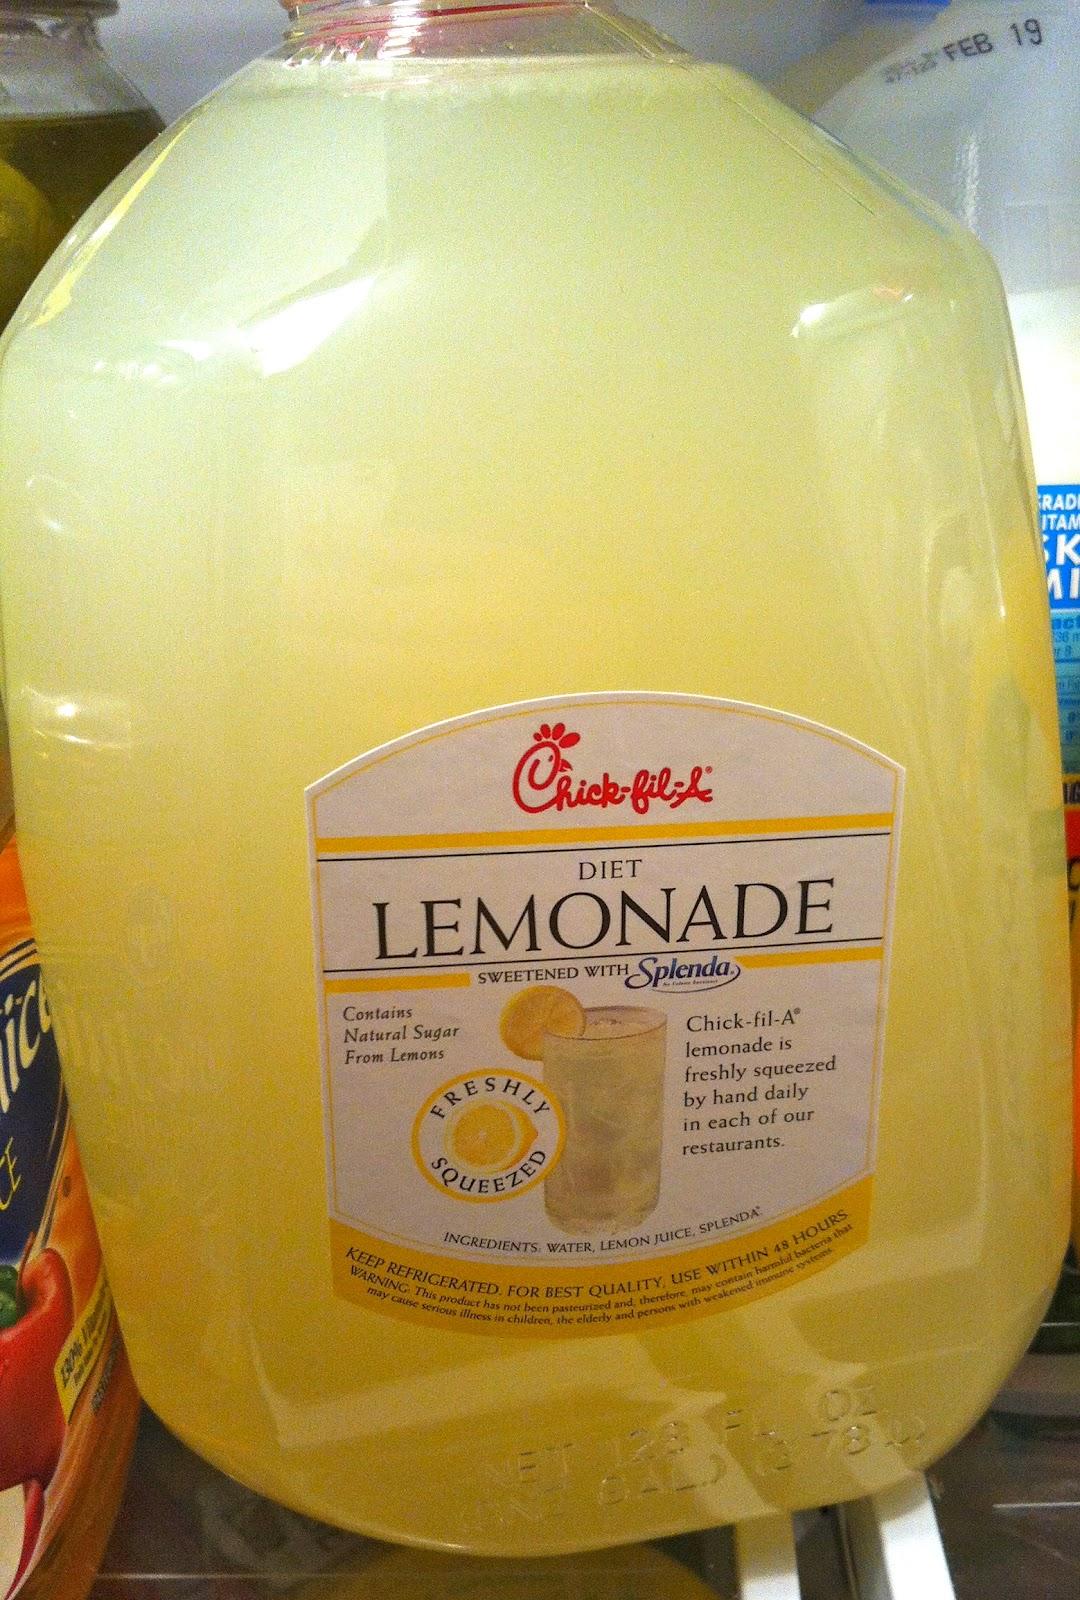 chick-fil-a, lemonade